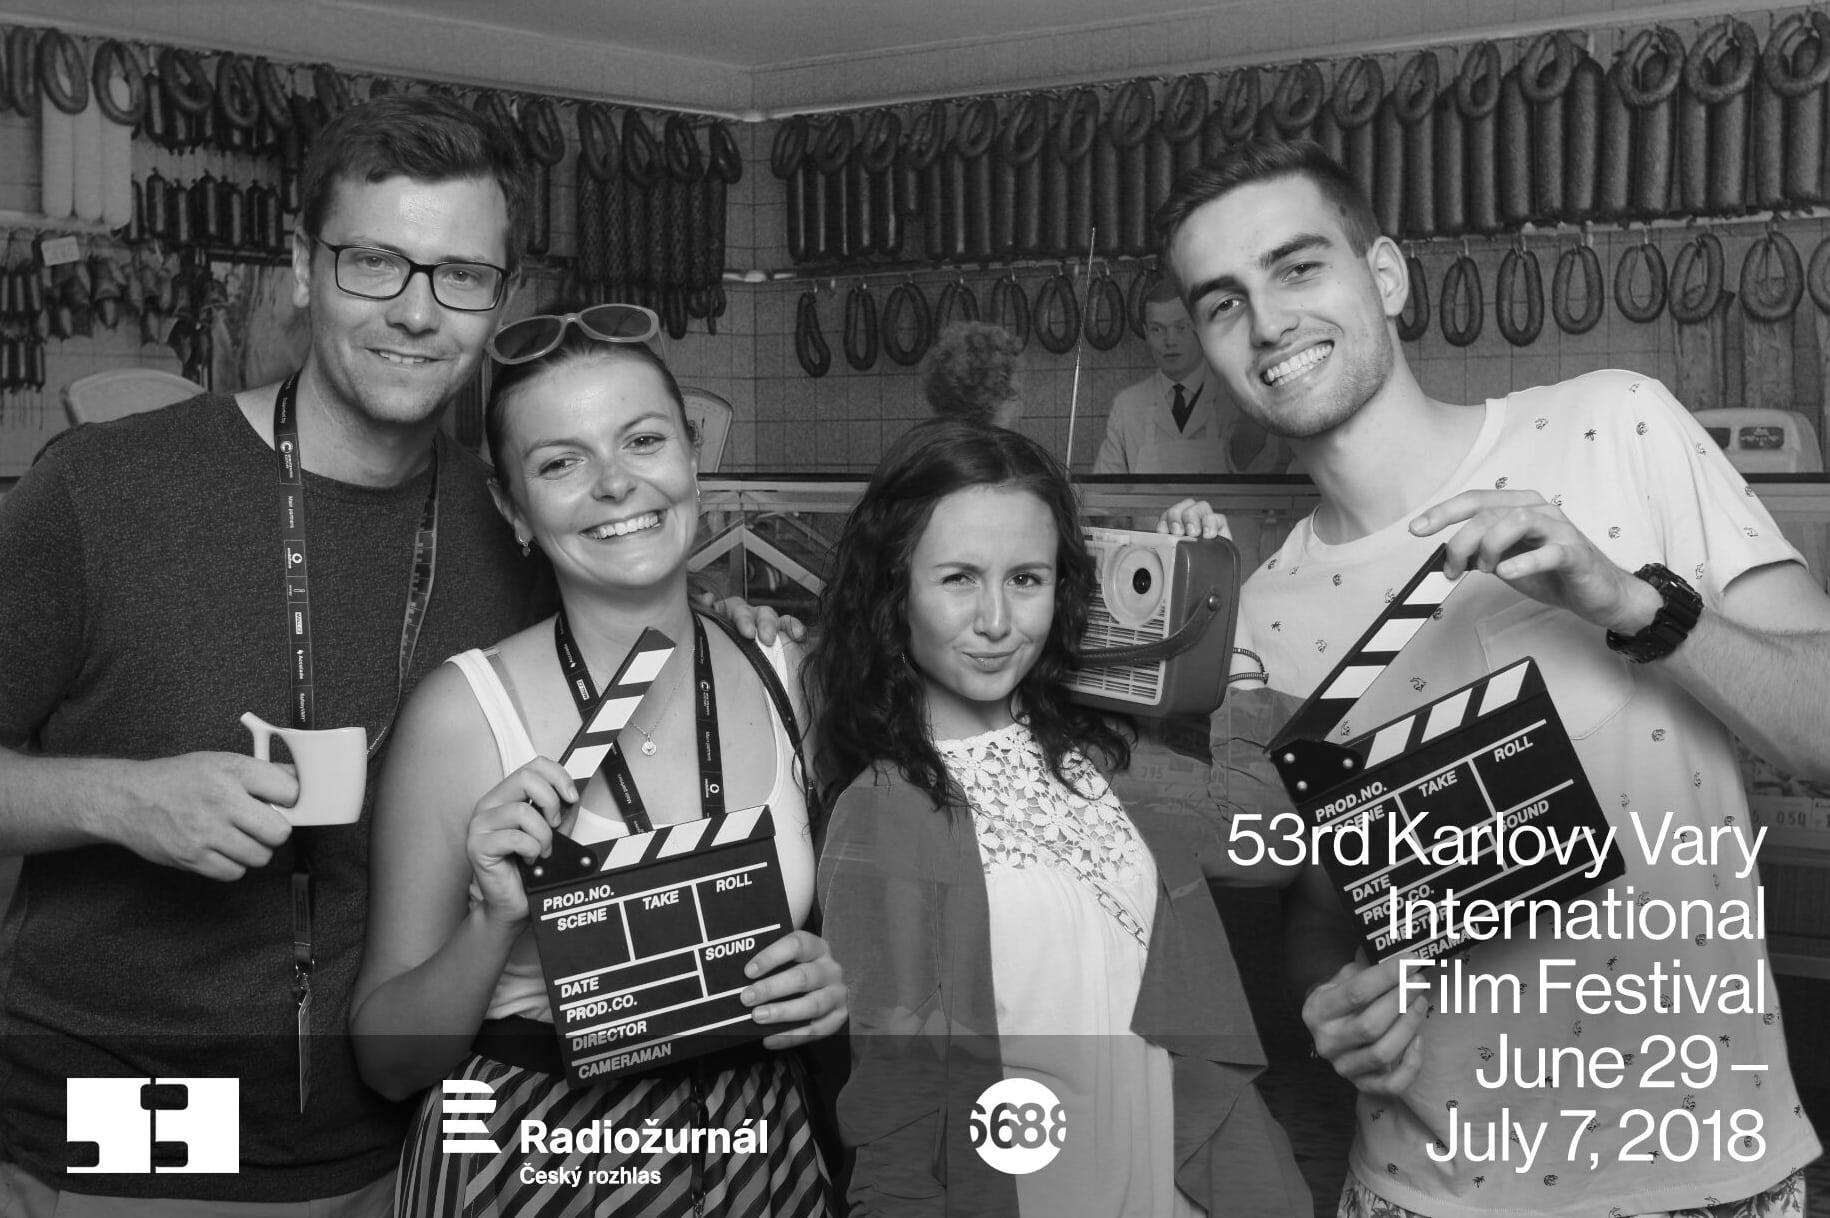 fotokoutek-festival-karlovy-vary-radiozurnal-mff-kv-5-7-2018-457606